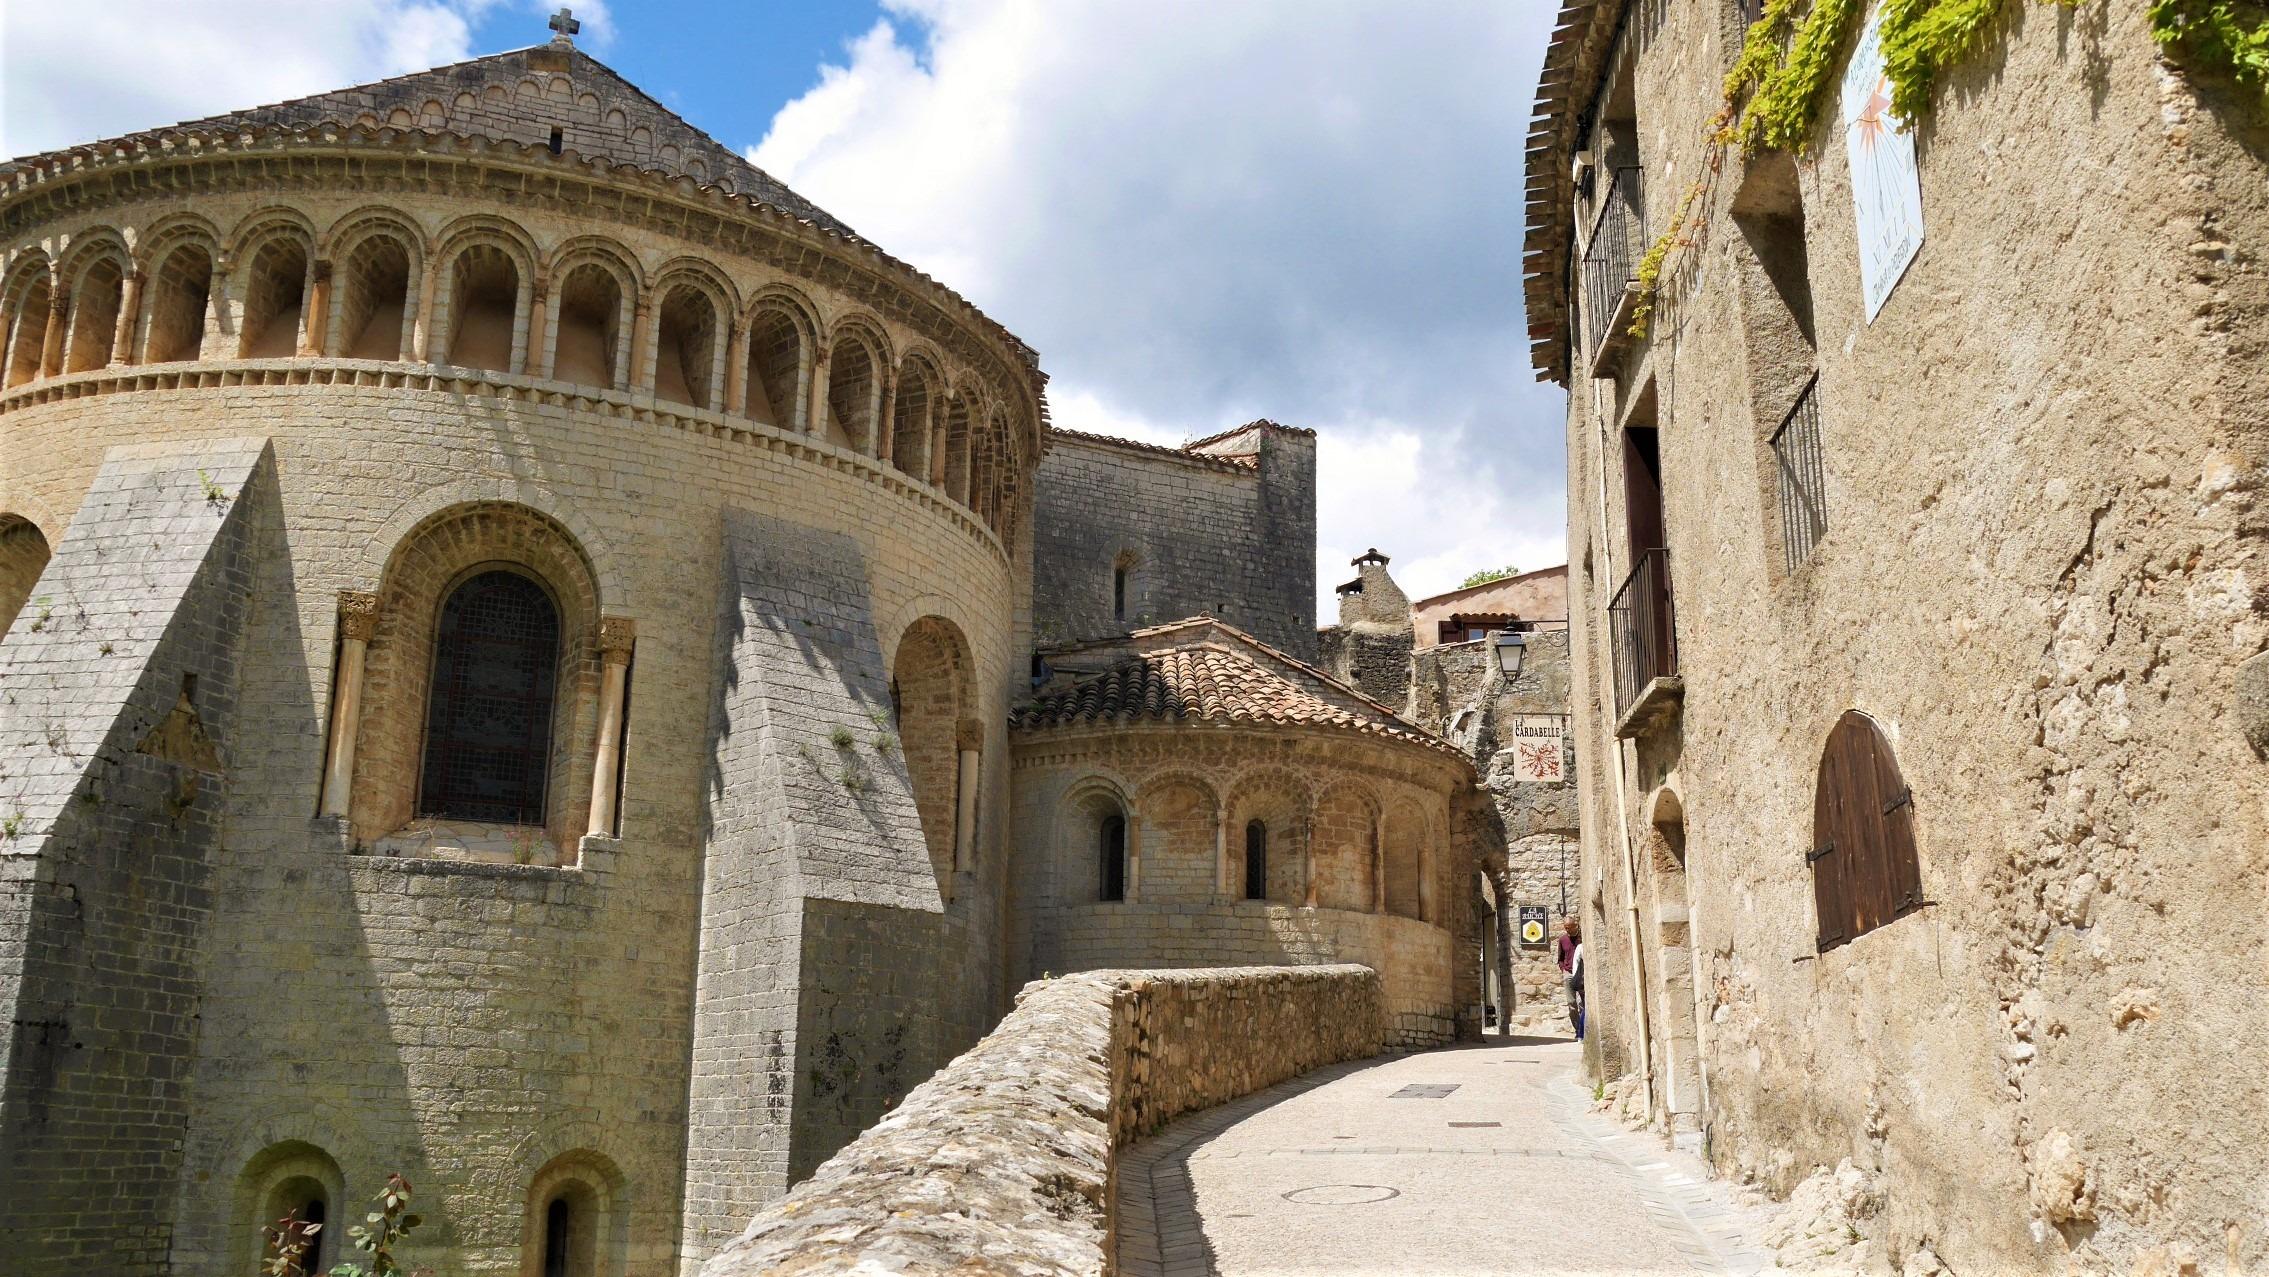 Saint Guilhem Desert abbaye Gellone infos pratiques blog voyage herault arpenter le chemin